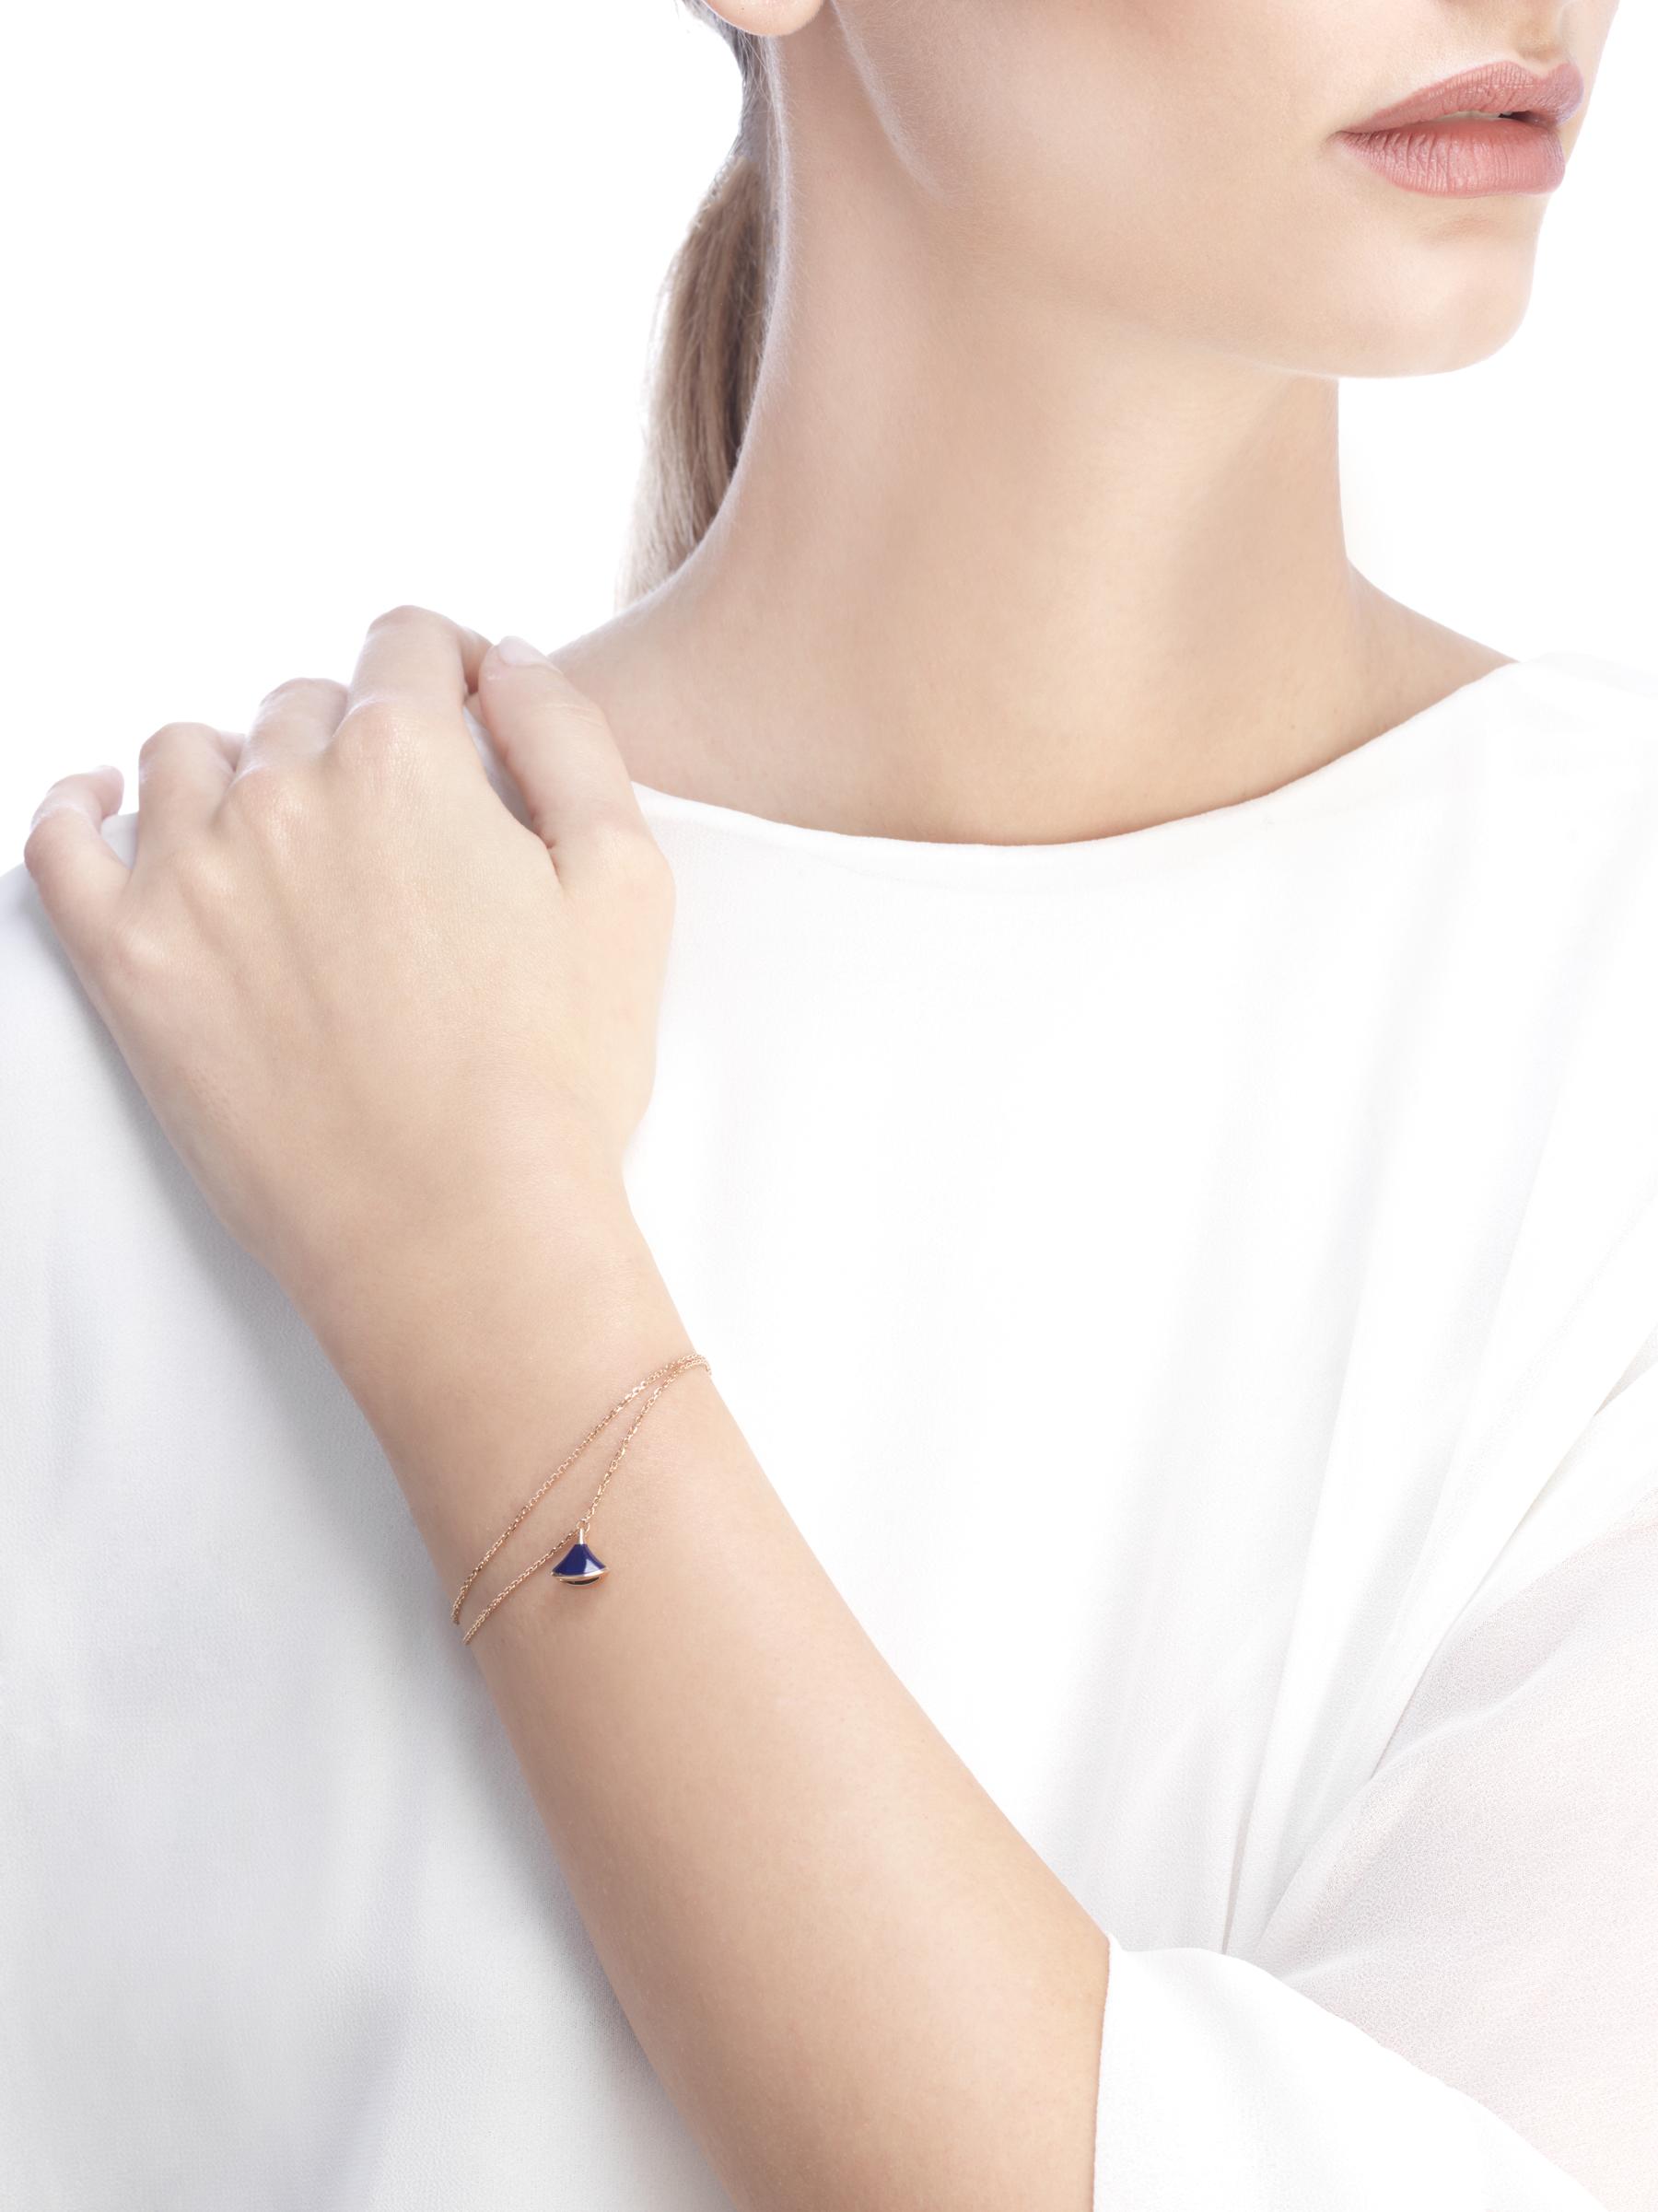 DIVAS' DREAM bracelet in 18 kt rose gold with pendant set with lapis lazuli. BR857290 image 3